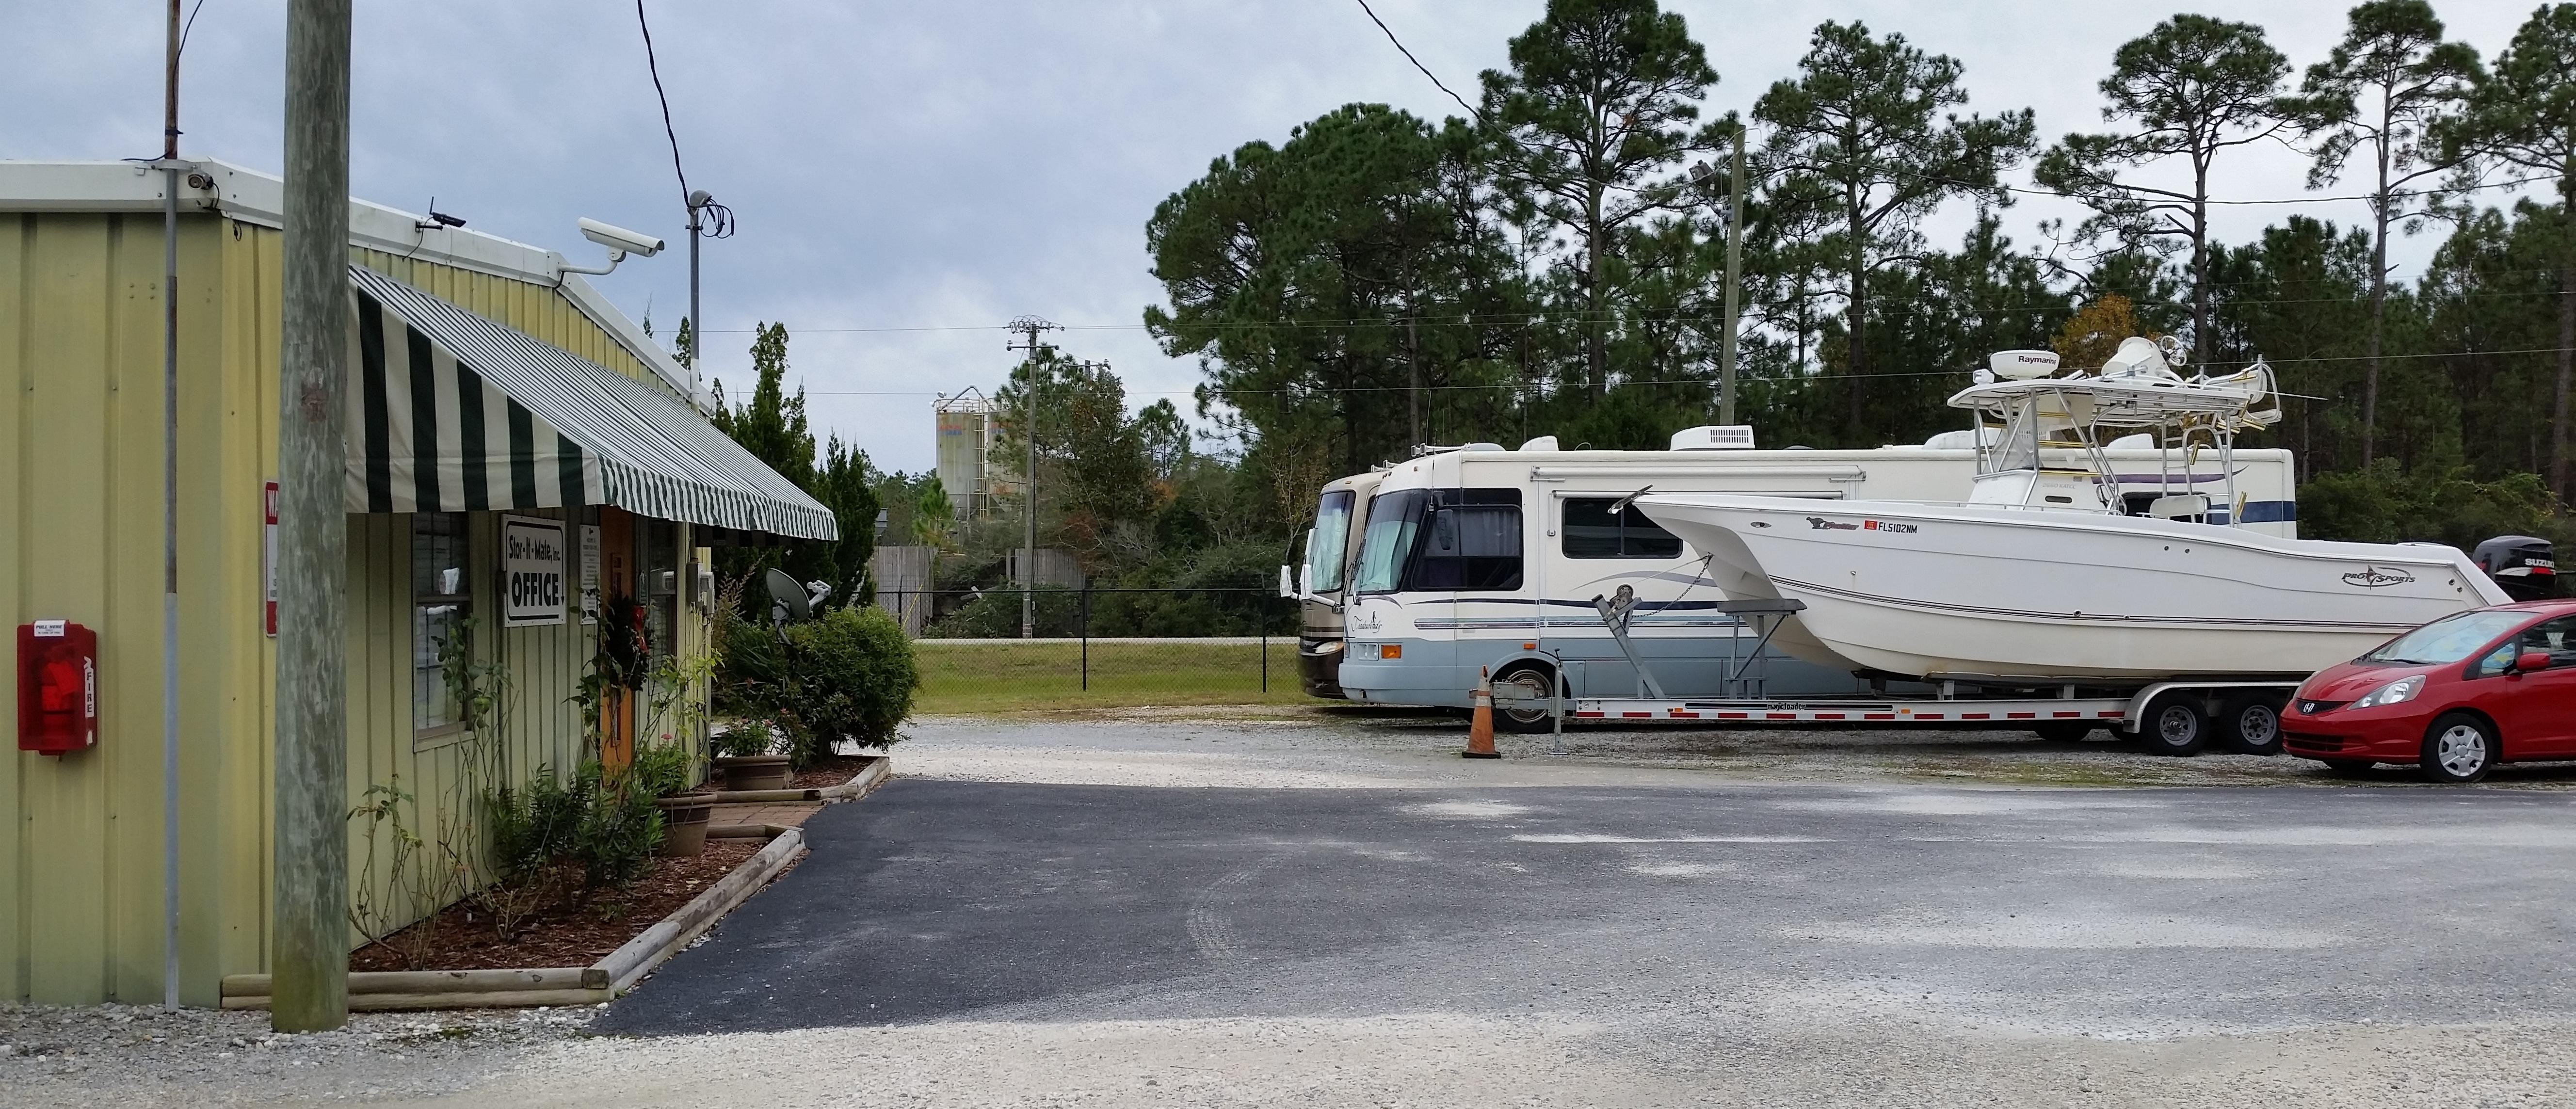 Storage Units Pensacola Fl Perdido Stor It Mate & Storage Units In Pensacola Fl - Listitdallas